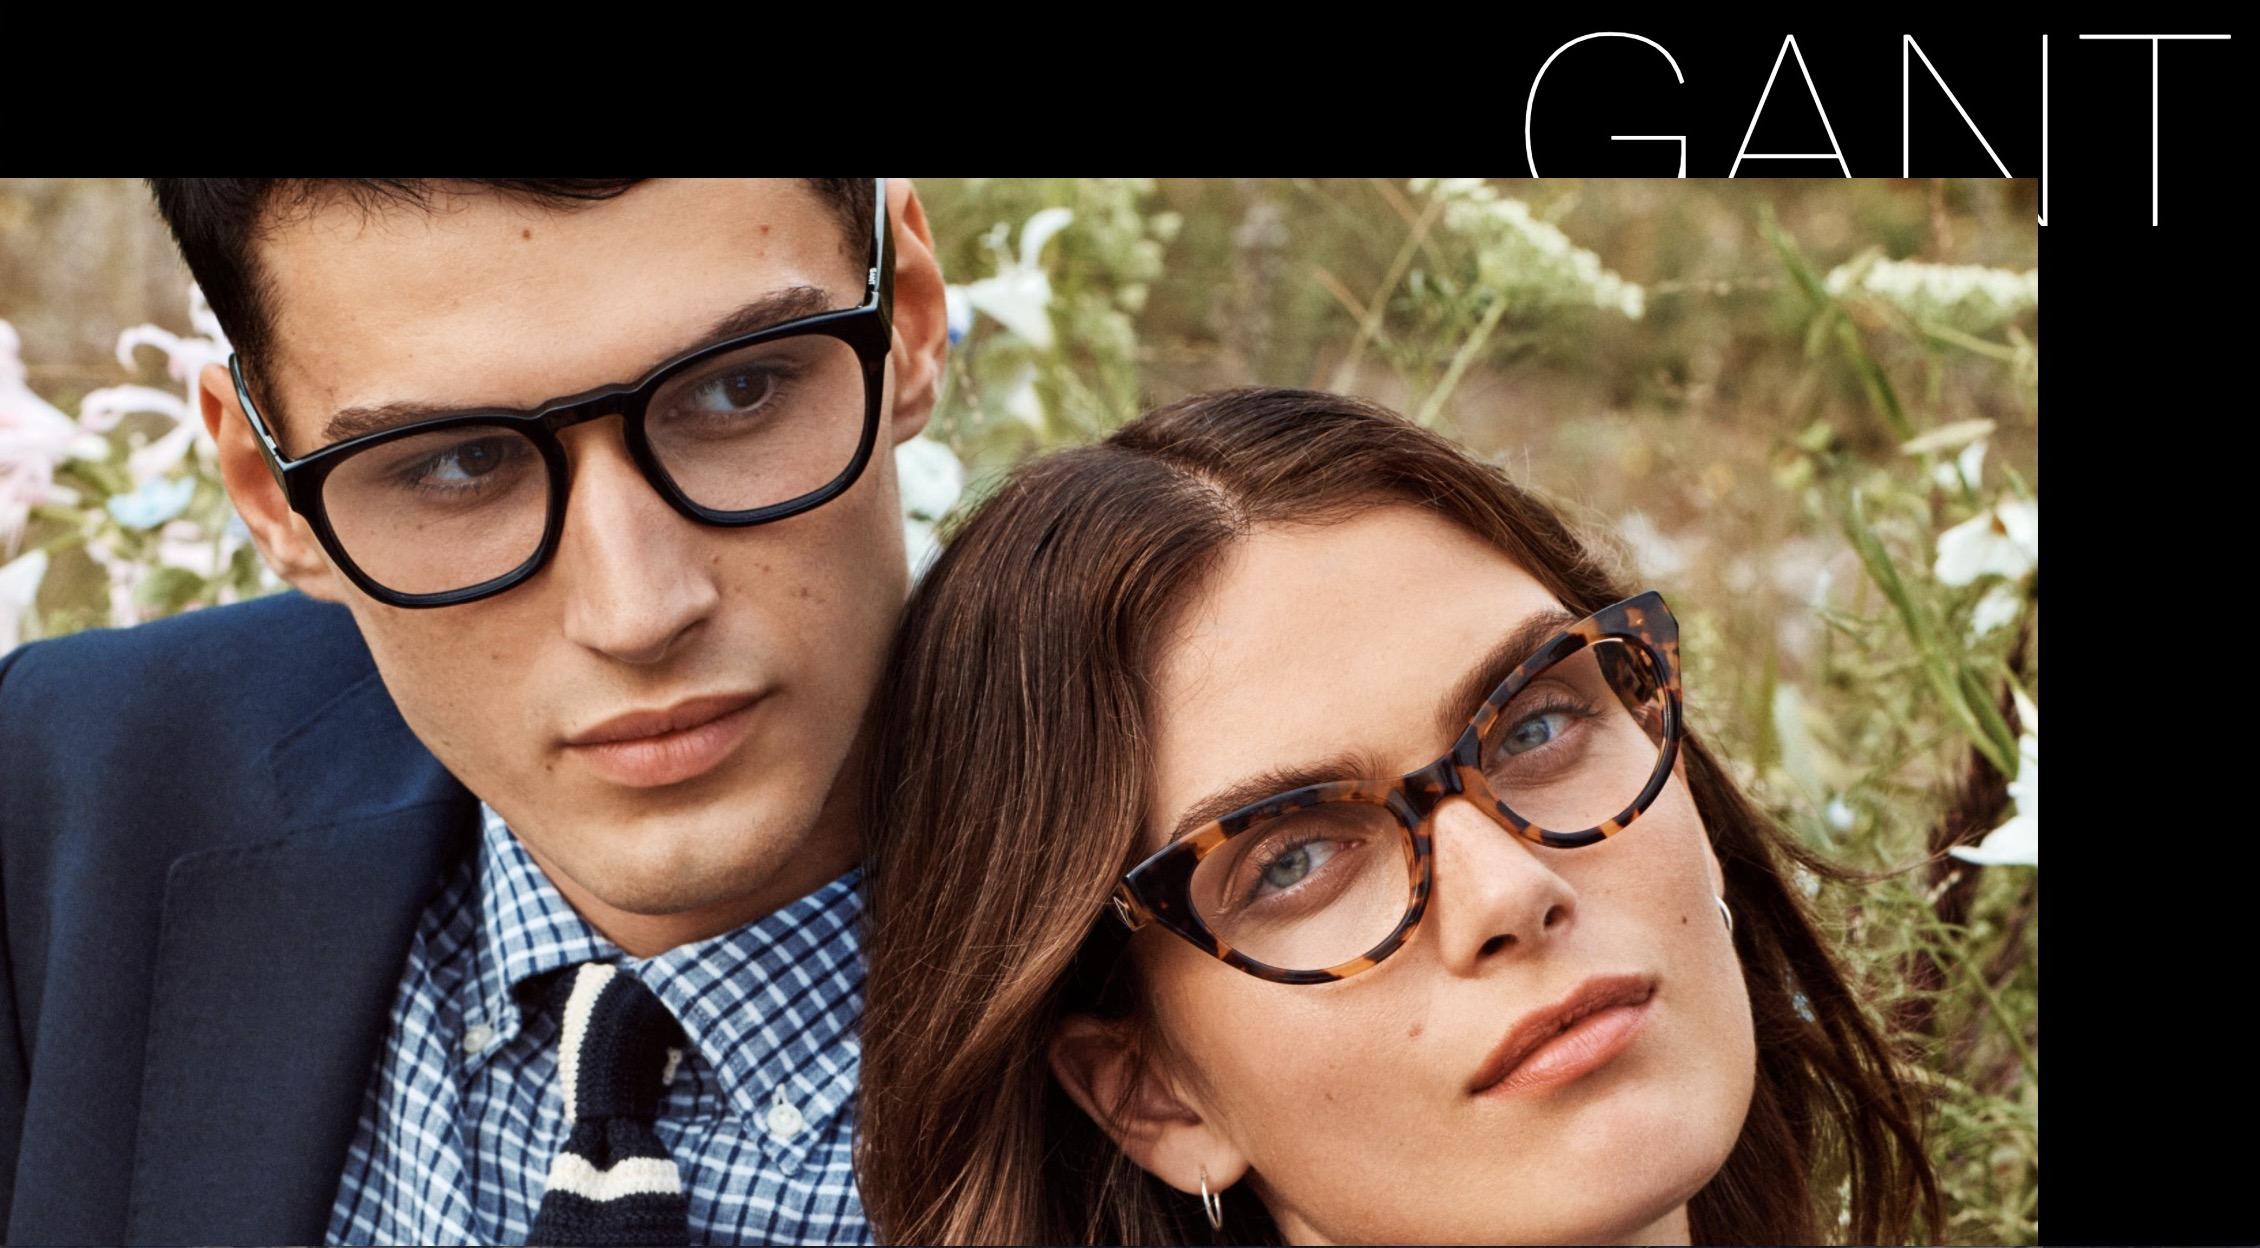 Gant Glasses